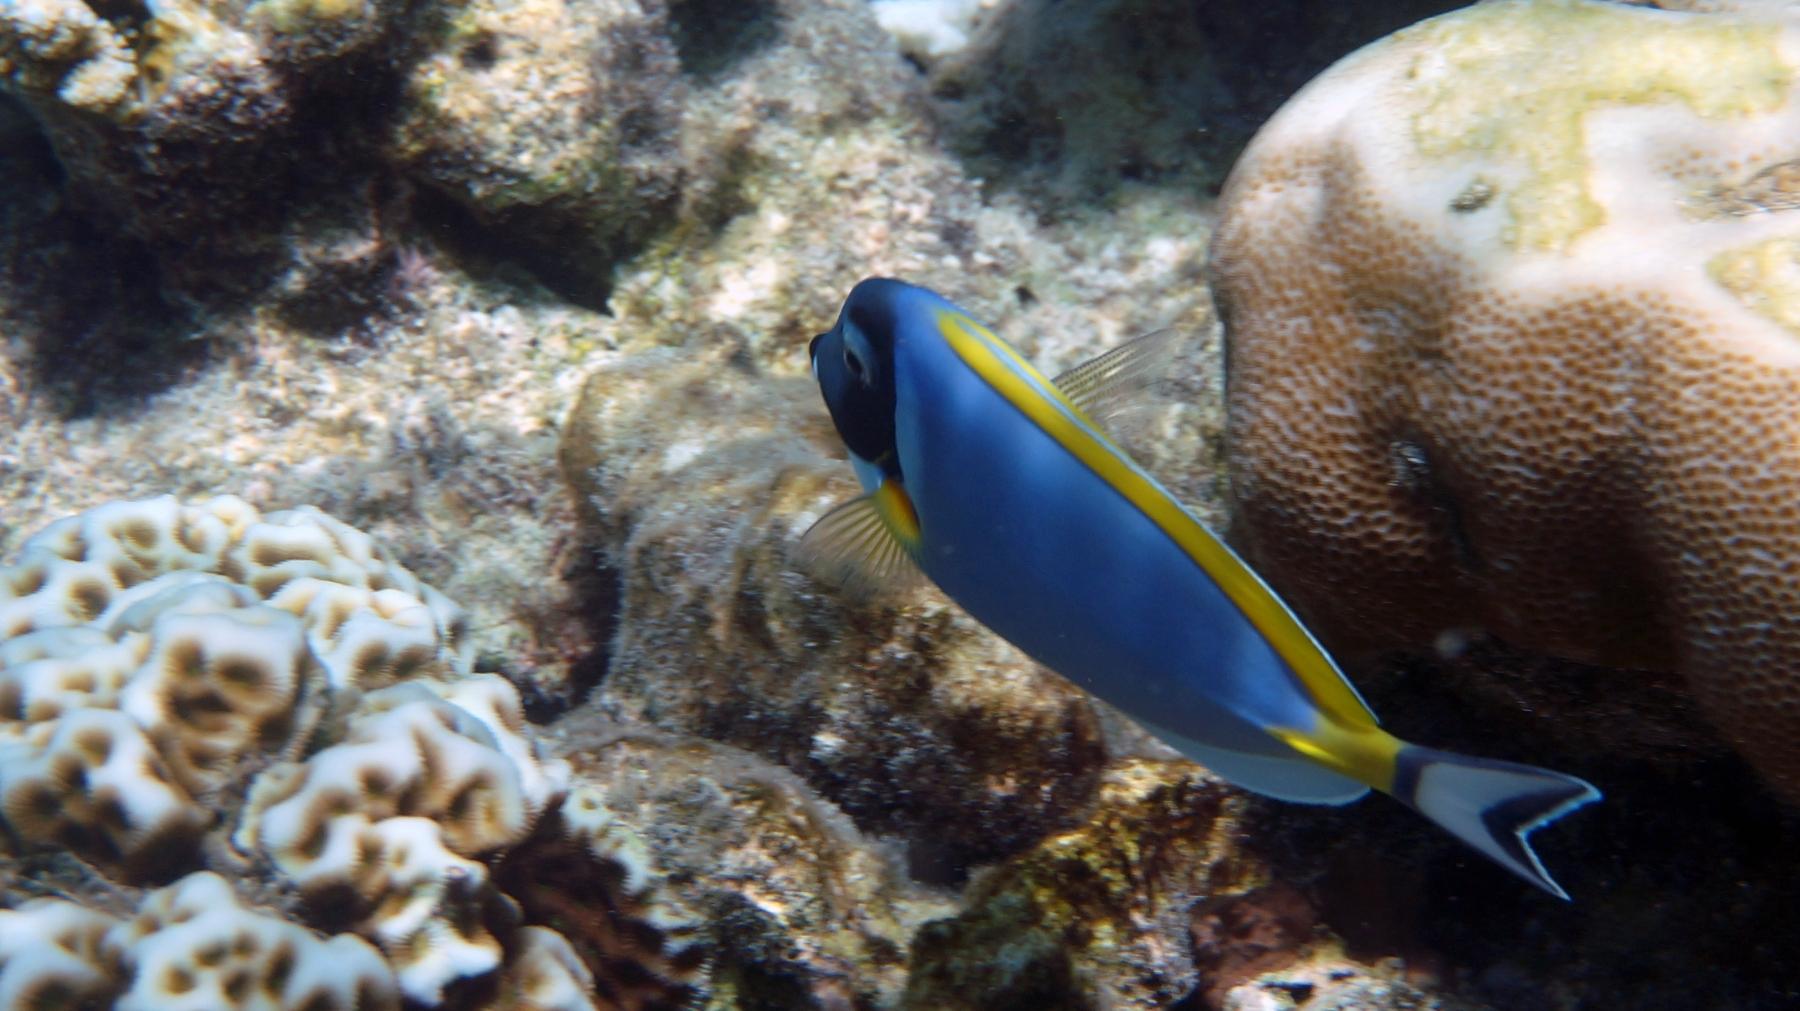 Acanthurus_leucosternon_012_C_Peces-Cirujano_L_Maldivas_U_Sebas_04072015